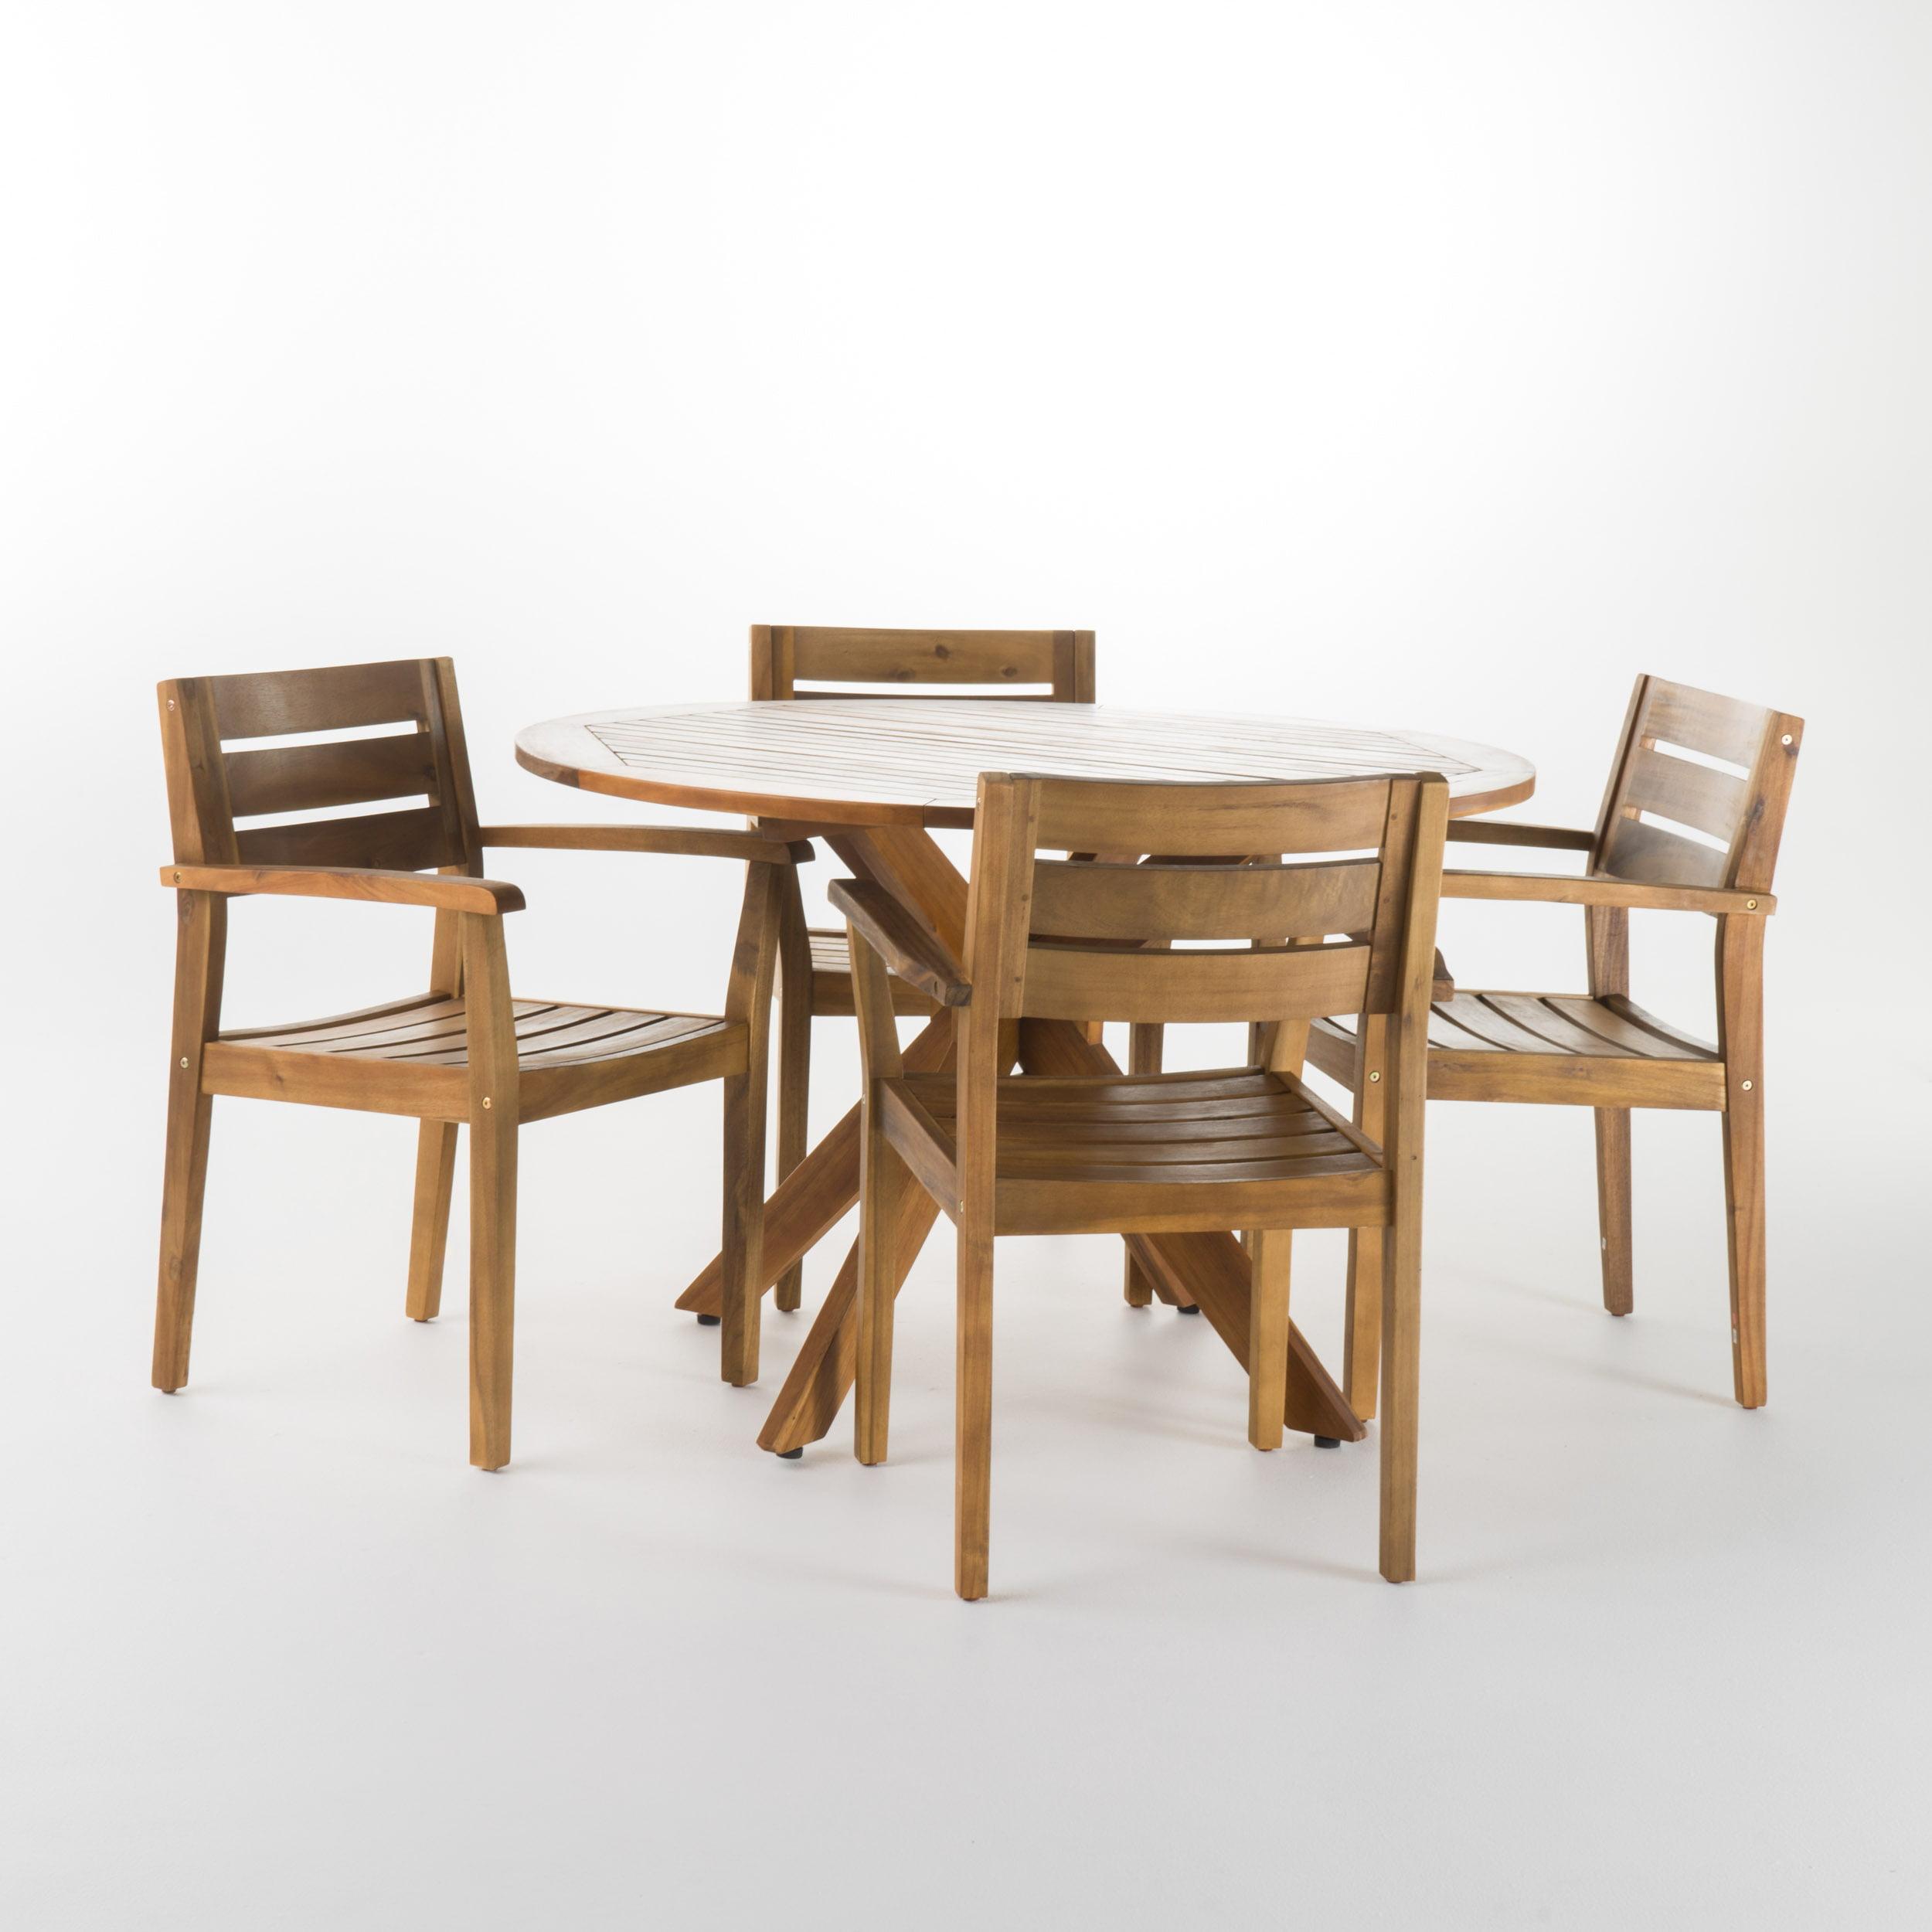 Stanford Outdoor 5 Piece Acaica Wood Round Dining Set, Teak Finish